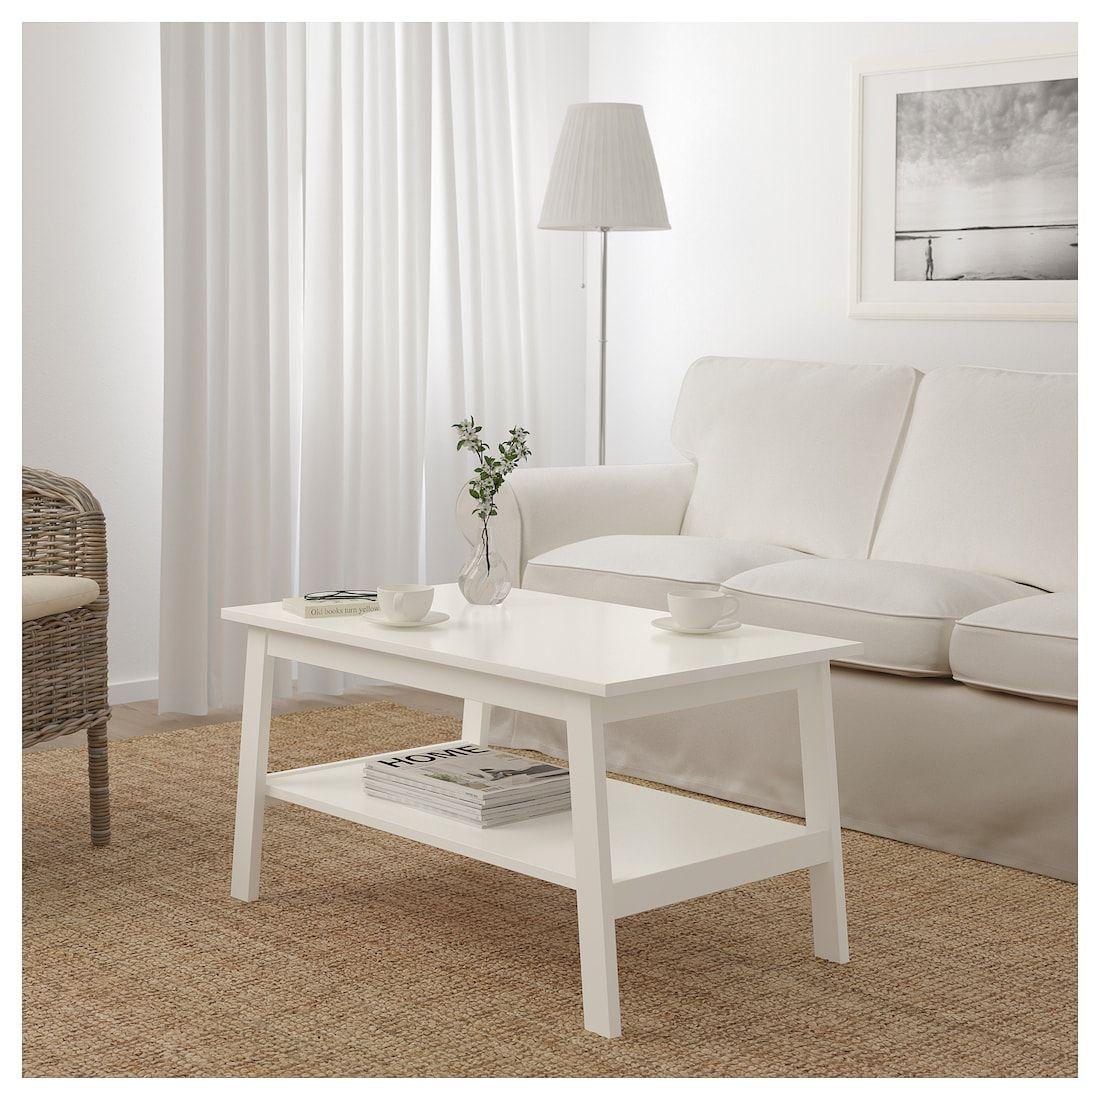 Ikea Mesas De Sala